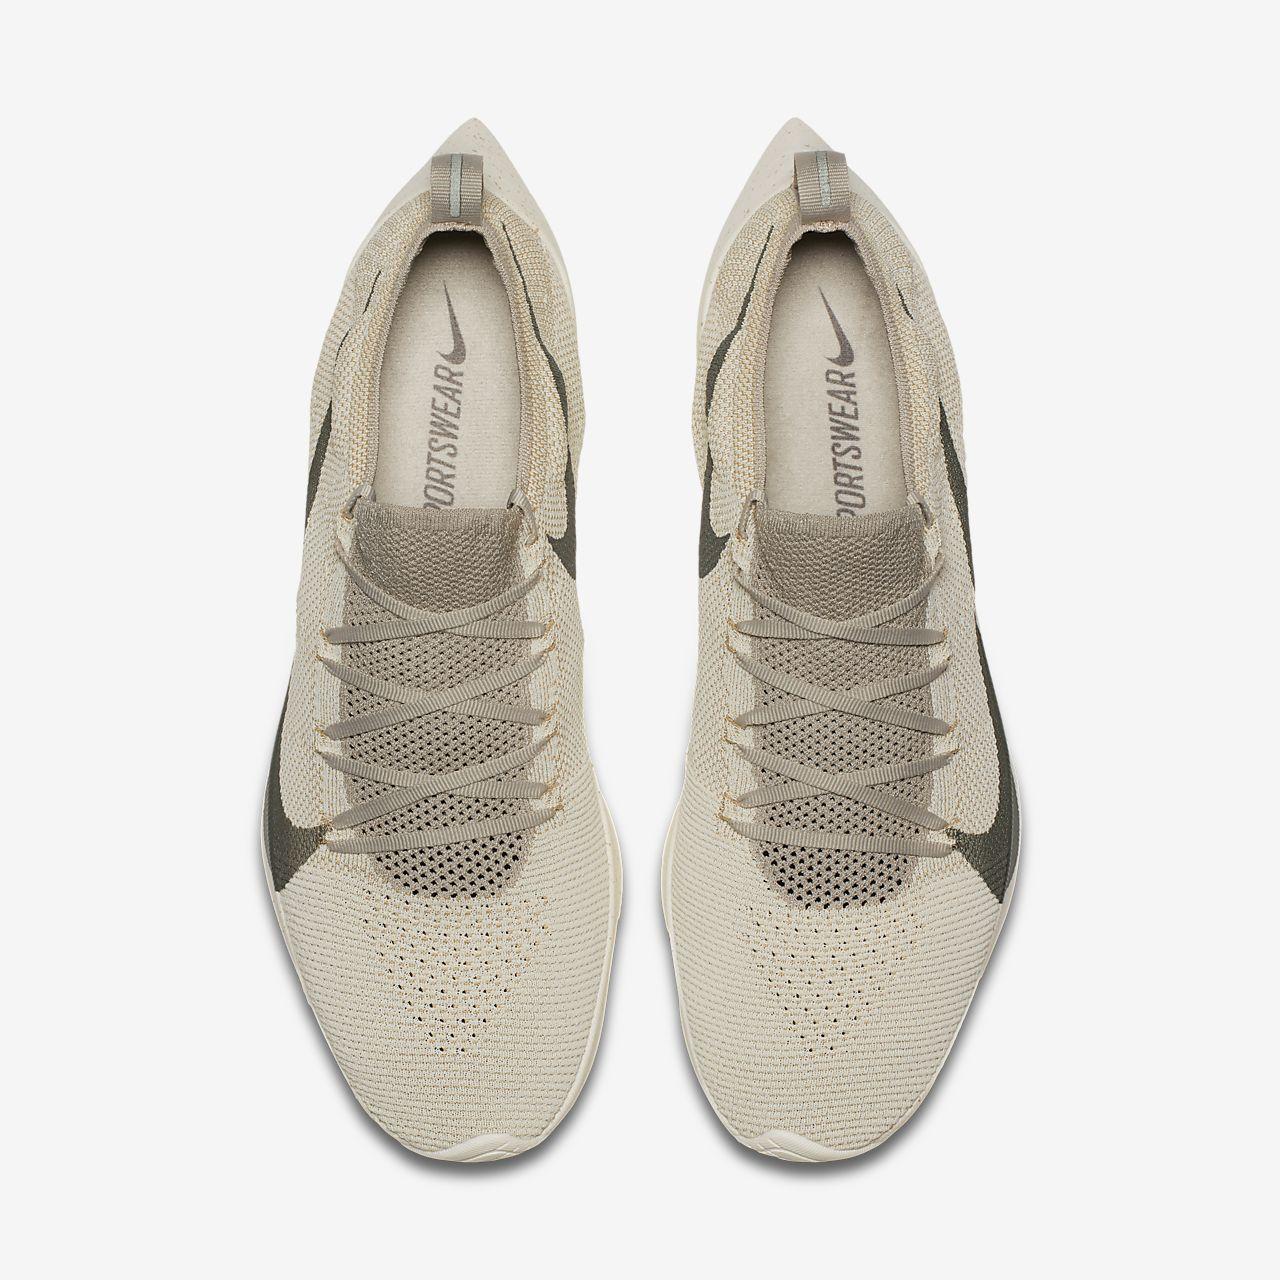 0b574b5c3314 Chaussure Nike React Vapor Street Flyknit pour Homme. Nike.com FR